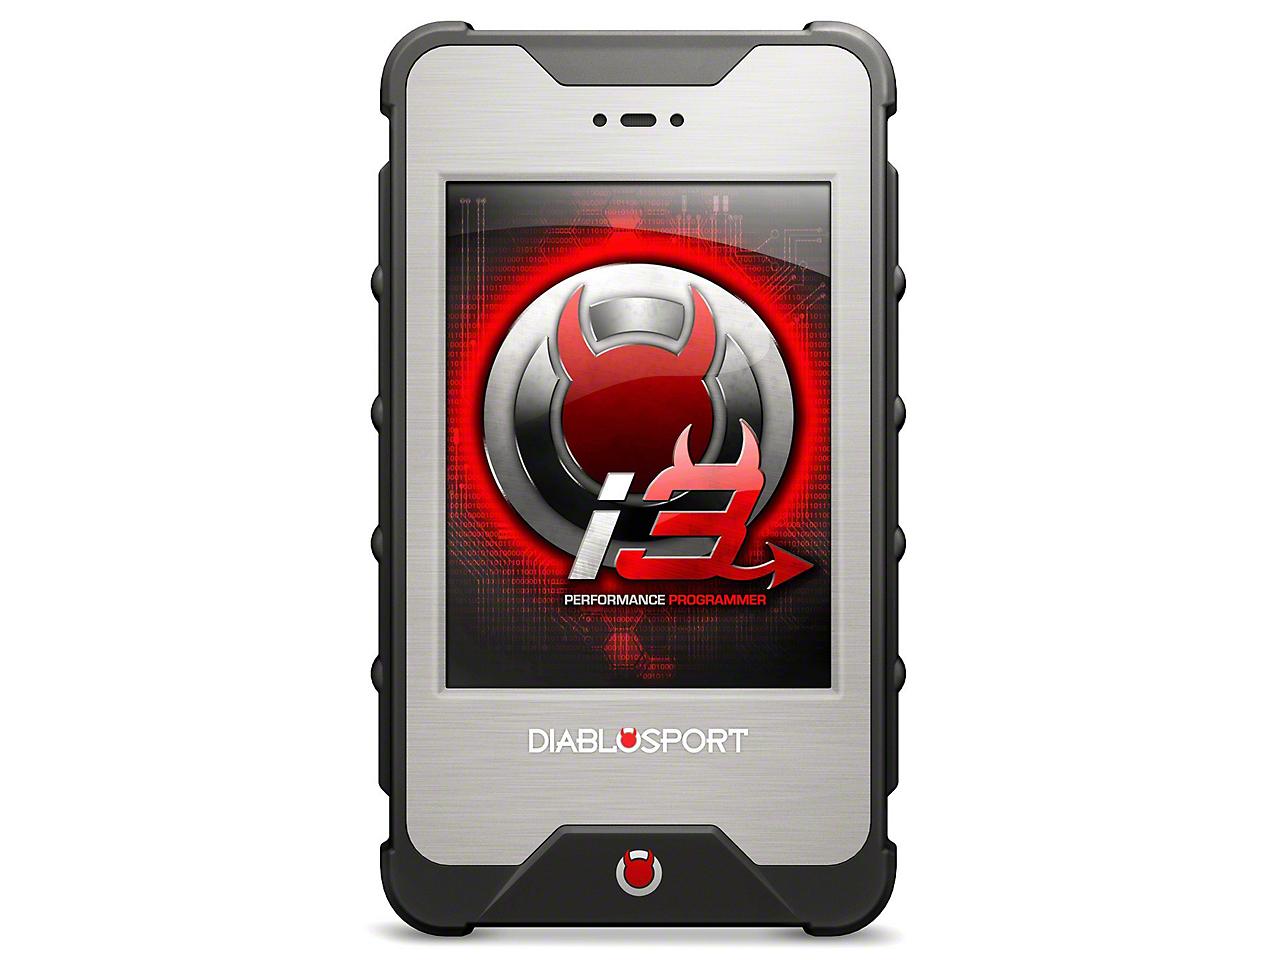 Diablosport inTune i3 Tuner (07-15 Wrangler JK)